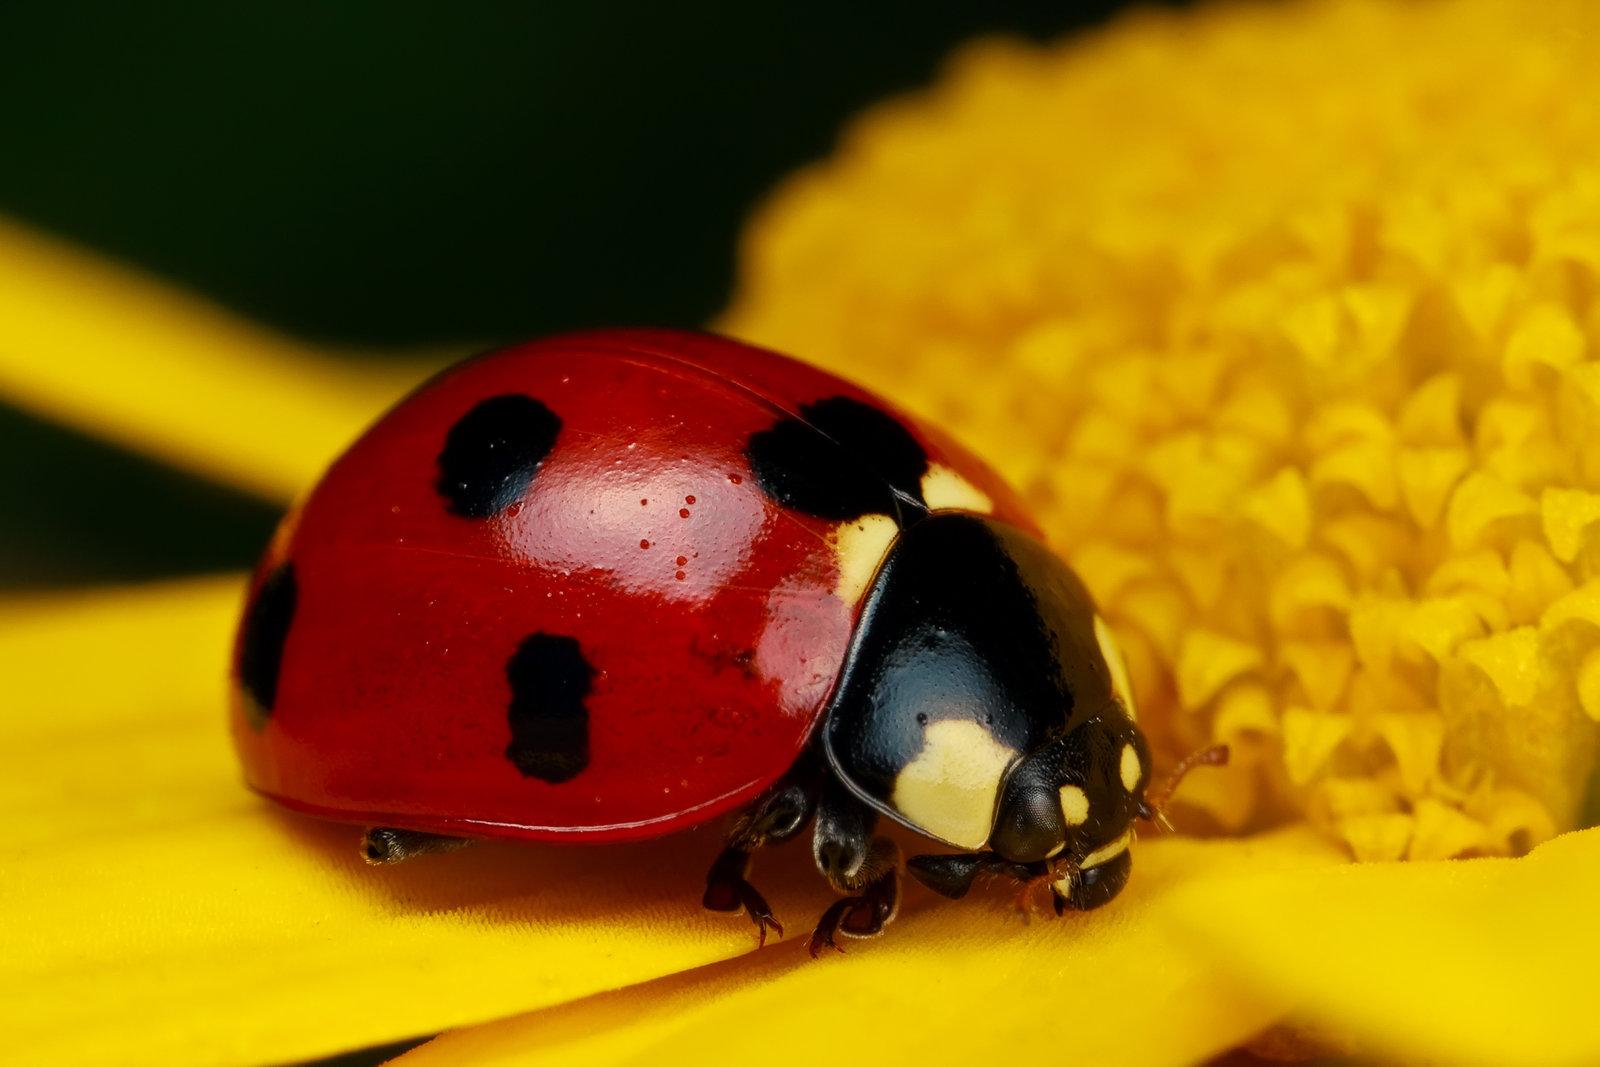 ladybug_on_yellow_iv_by_dalantech